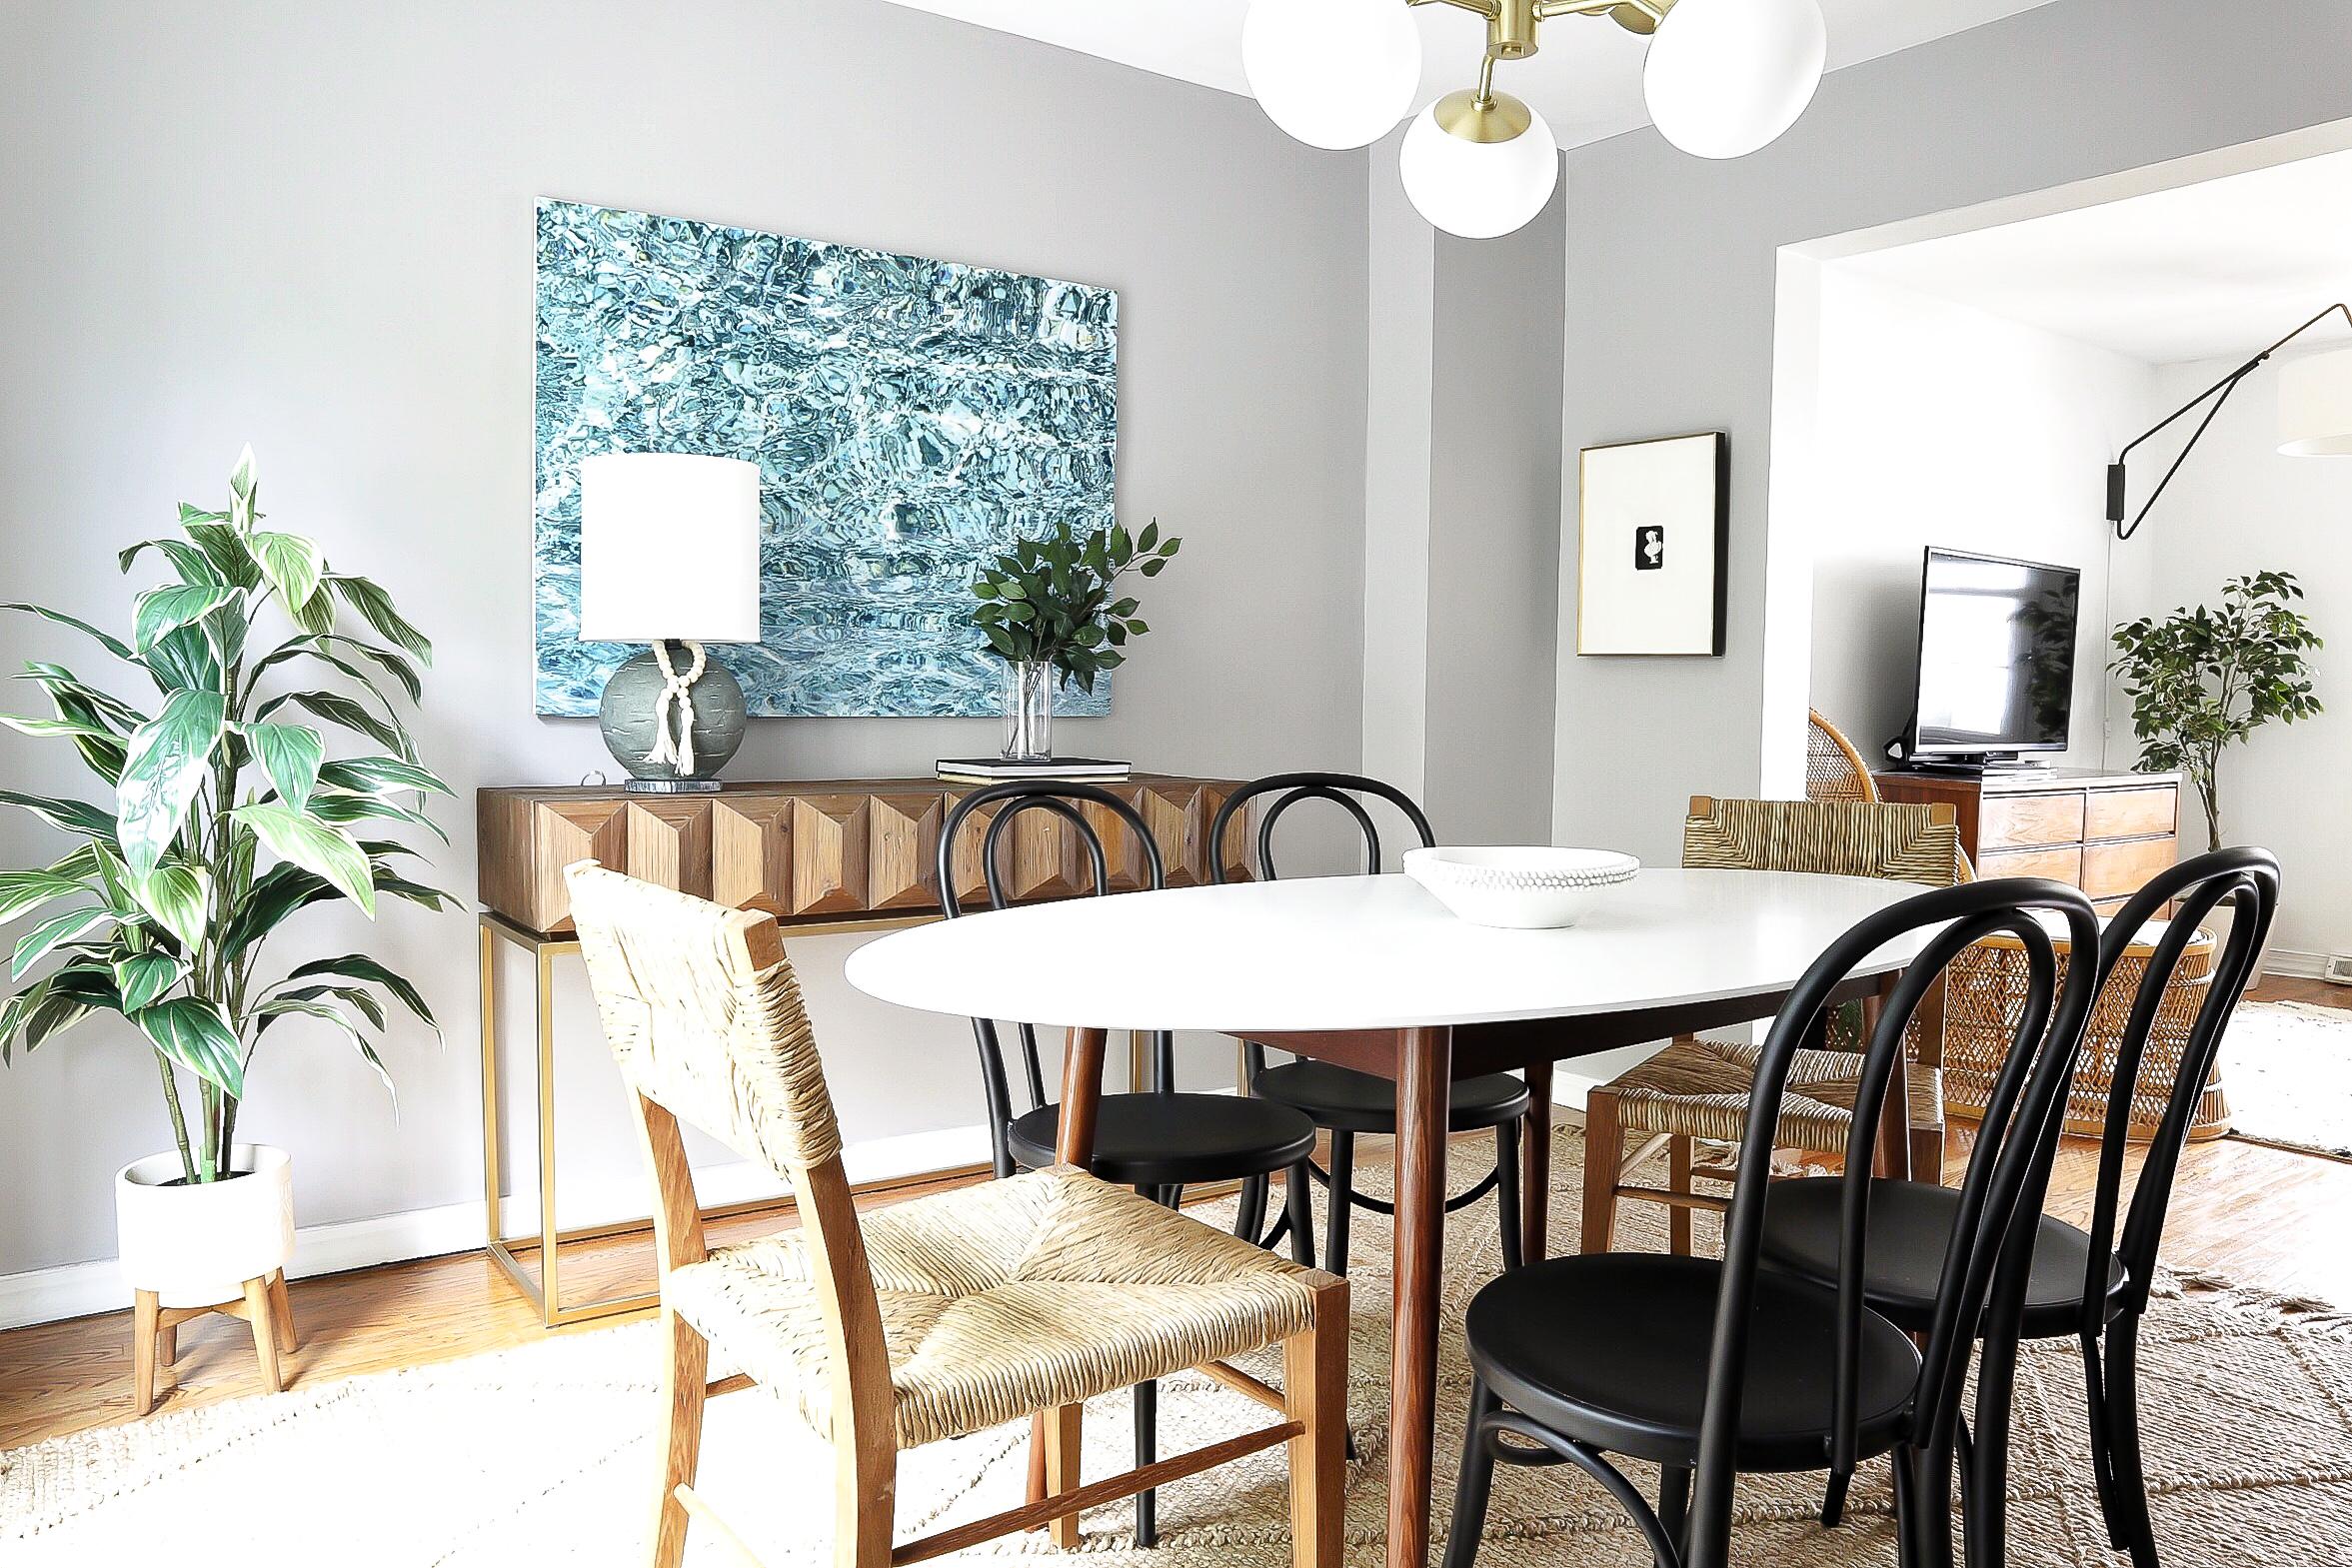 Modern-Coastal-Beachy-Dining-Room-2.jpg